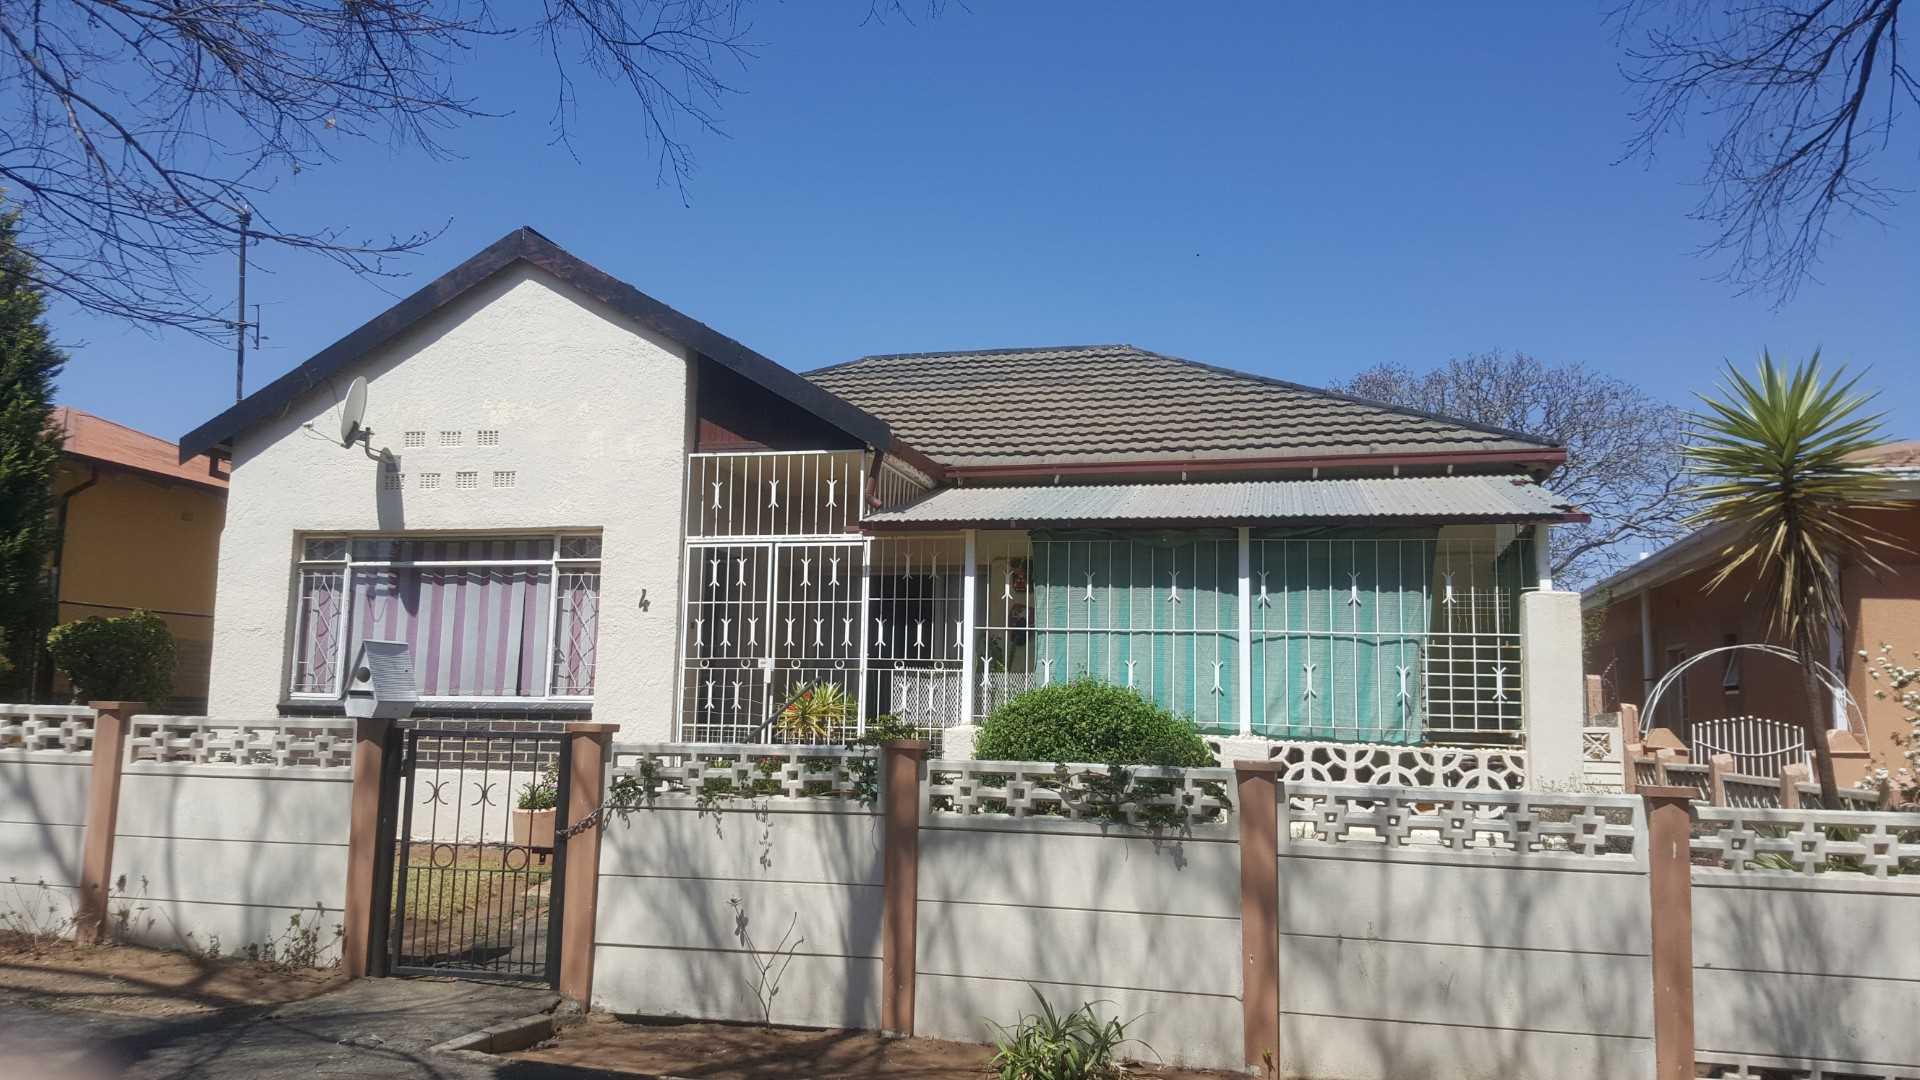 Forest Hill, 4 bedrooms,1.5 bathrooms, Johannesburg